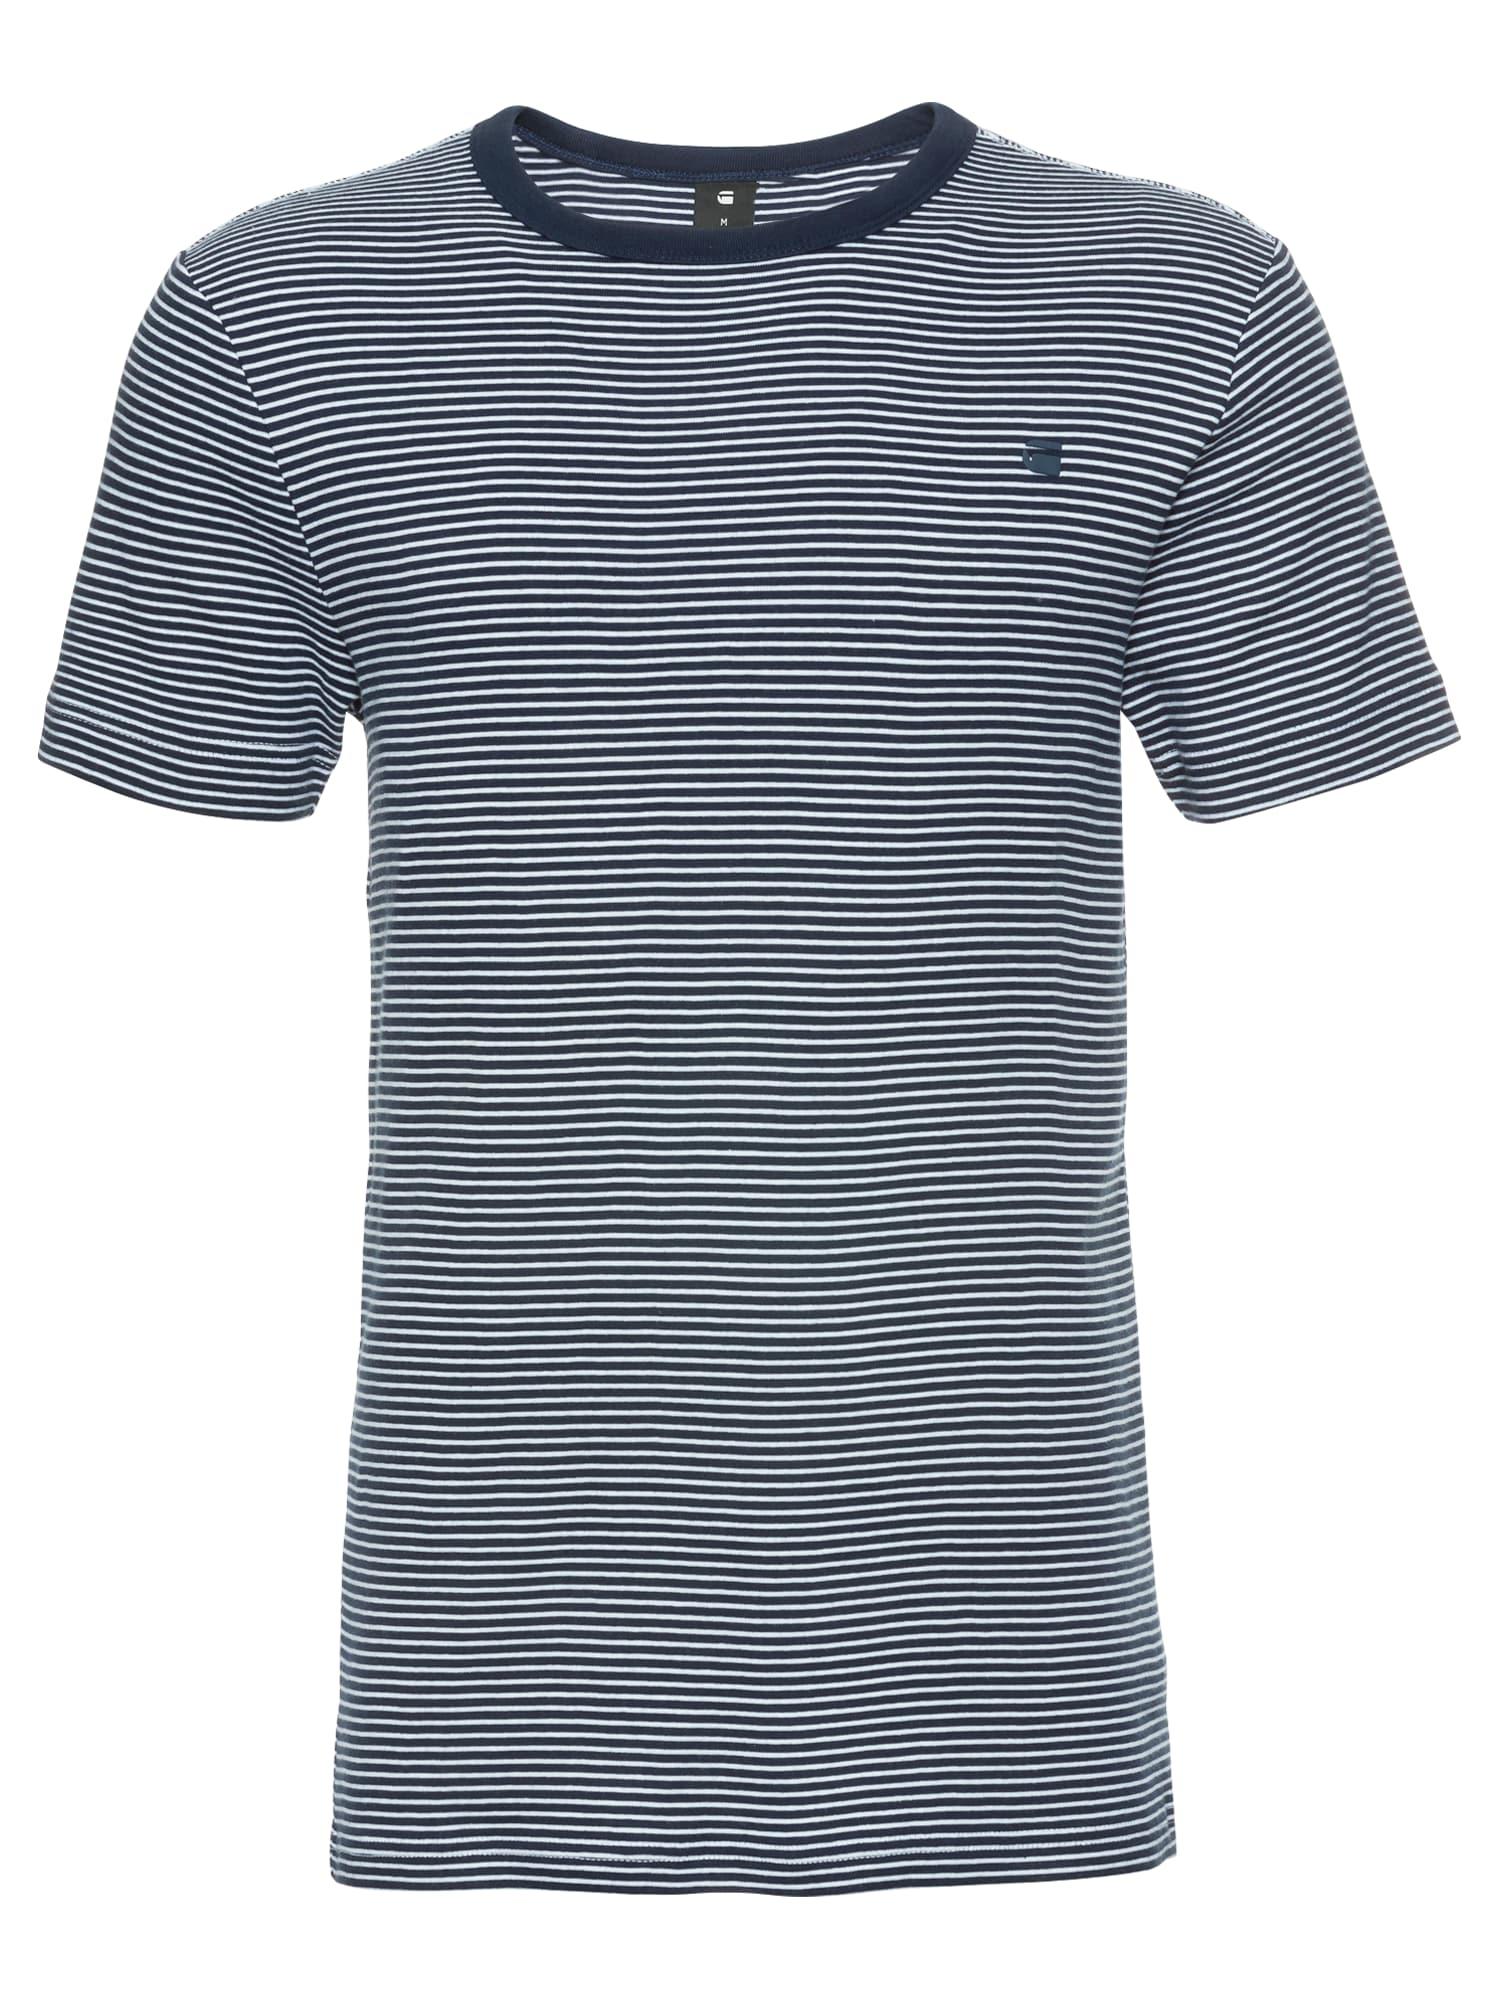 G-STAR RAW Heren Shirt Ciaran stripe r t s s blauw wit